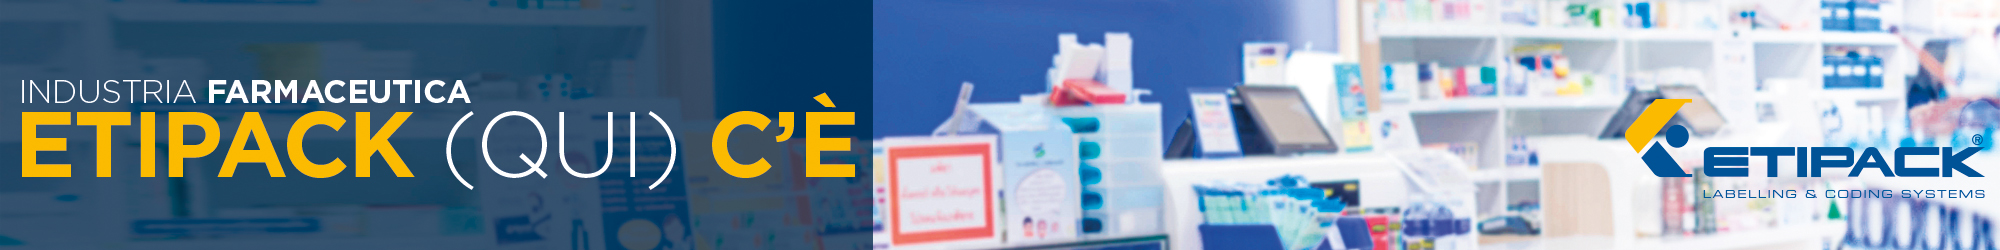 soggetto Pharma